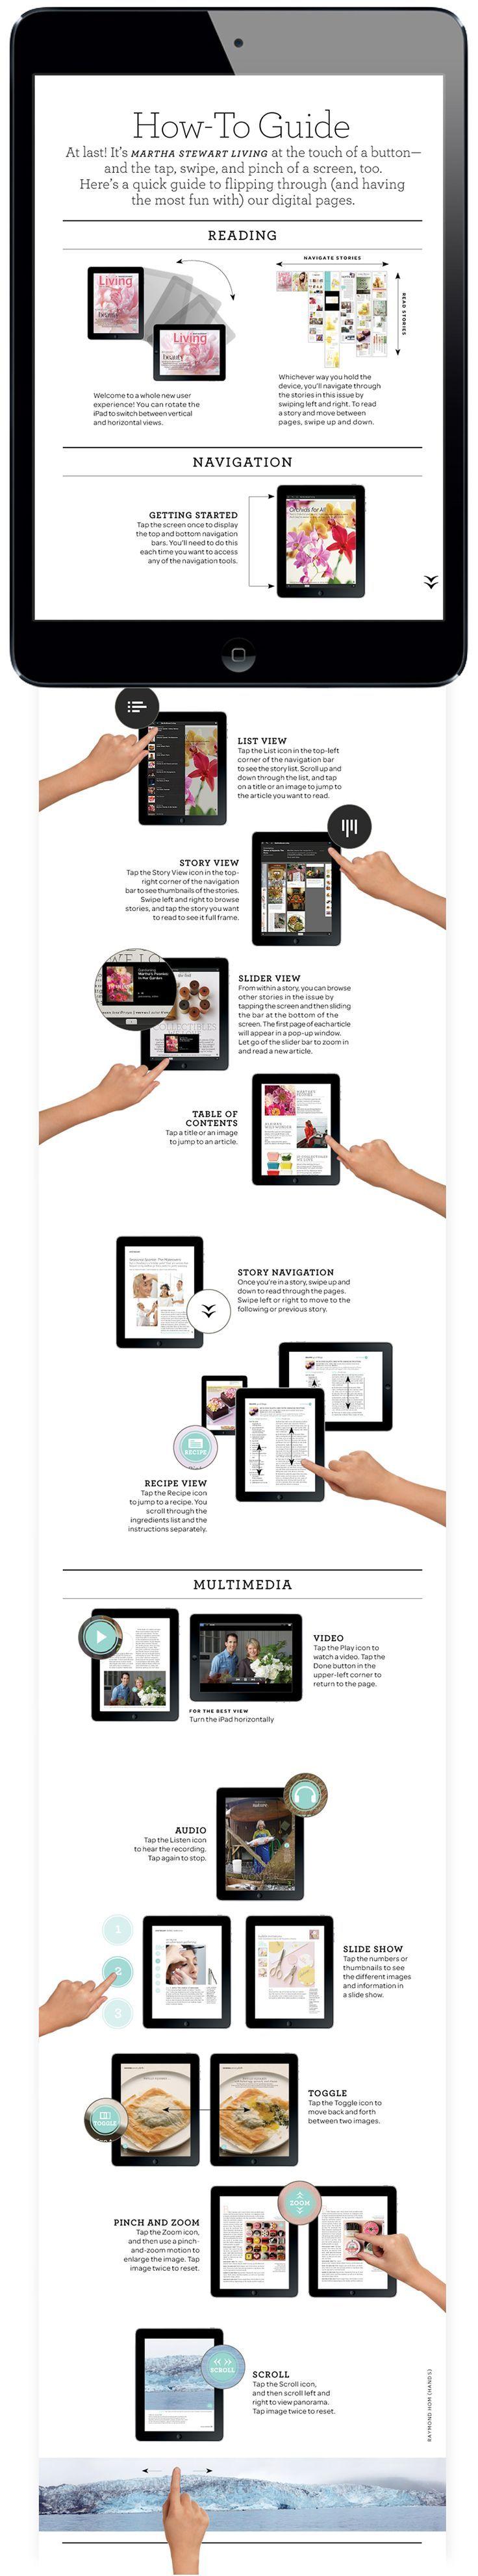 Navigation (How-to Guide). Martha Stewart Living Magazine for iPad